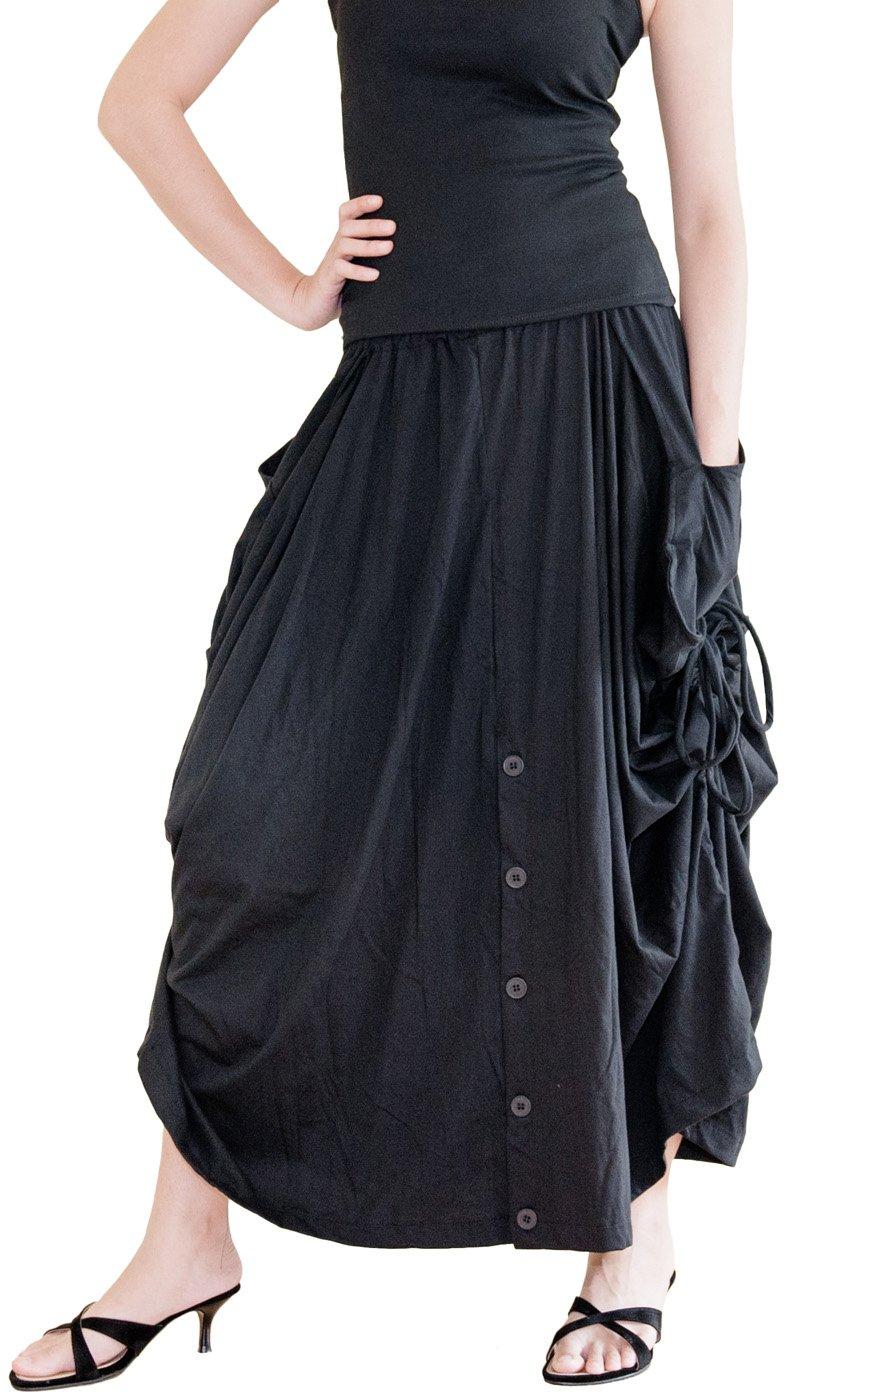 BohoHill Convertible Maxi Skirt Pants Cotton Jersey Versatile Skirt (Black)